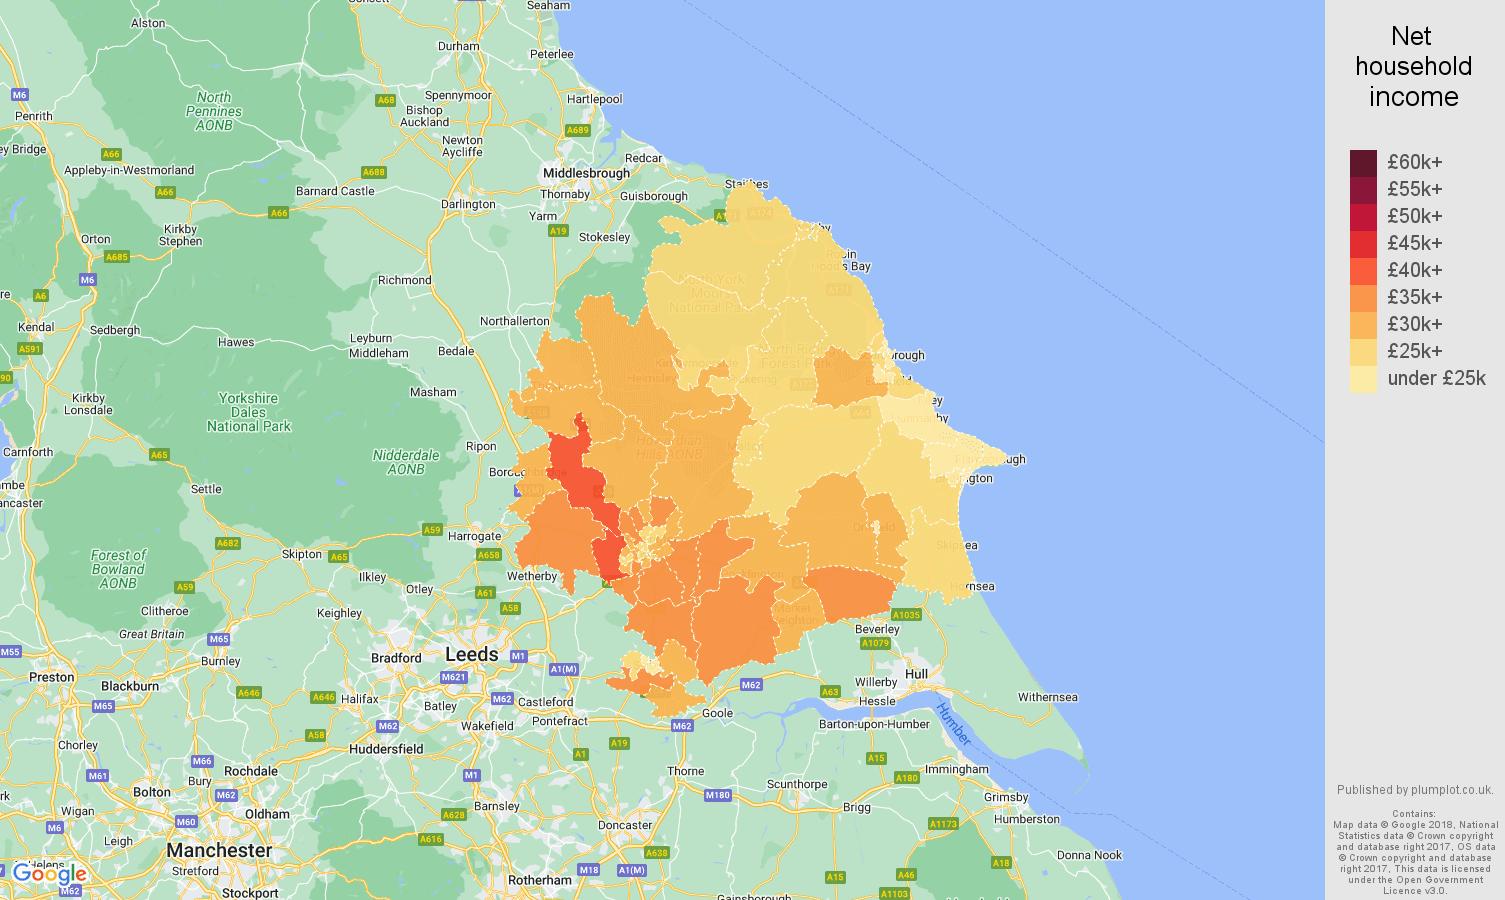 York net household income map